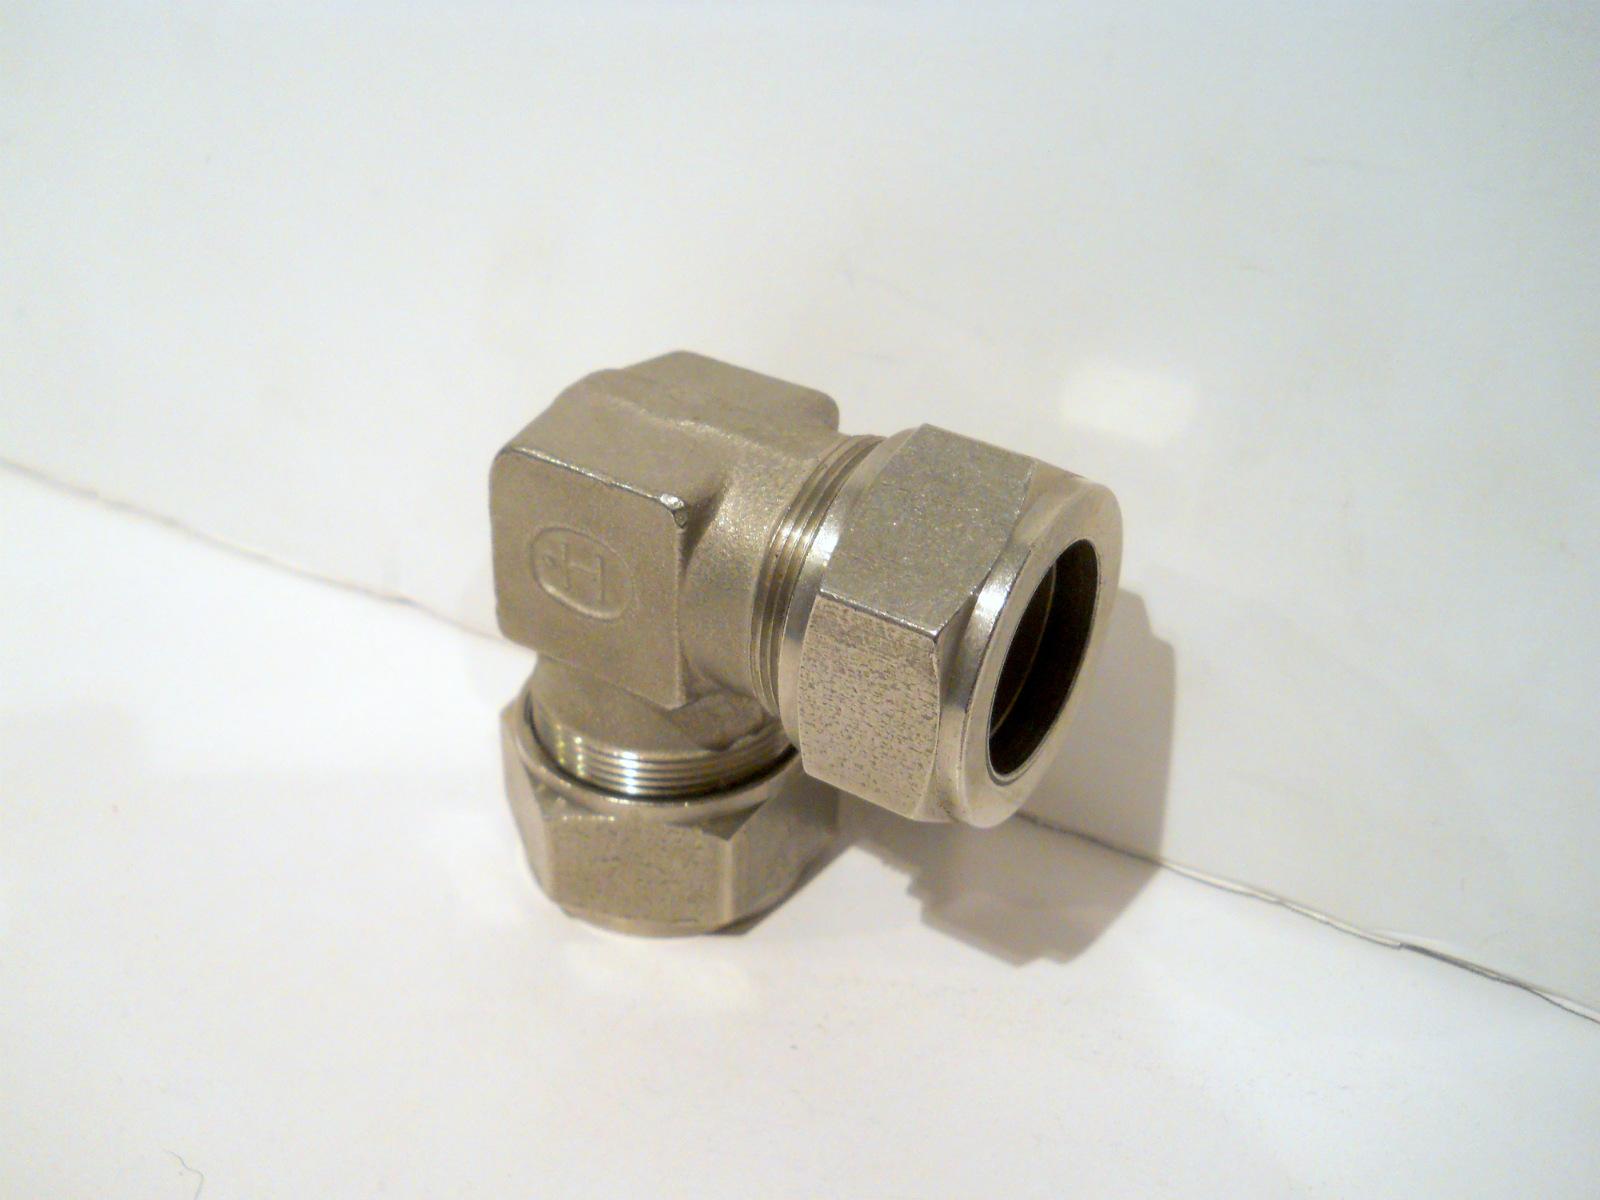 New hoke gyrolok stainless steel quot tube o d union elbow